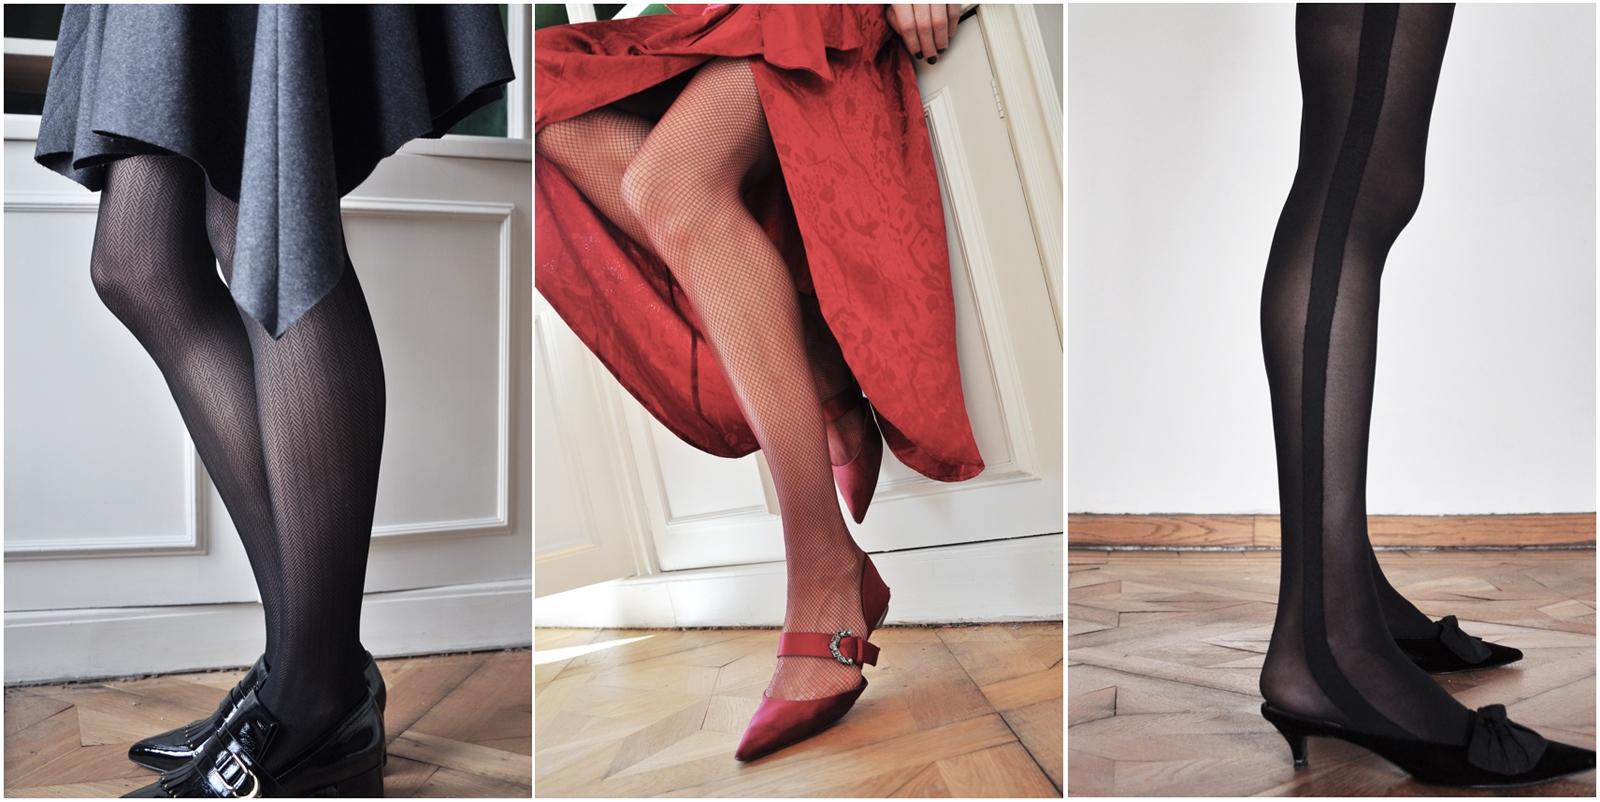 Drei Strumpfhosenmodelle von Swedish Stockings